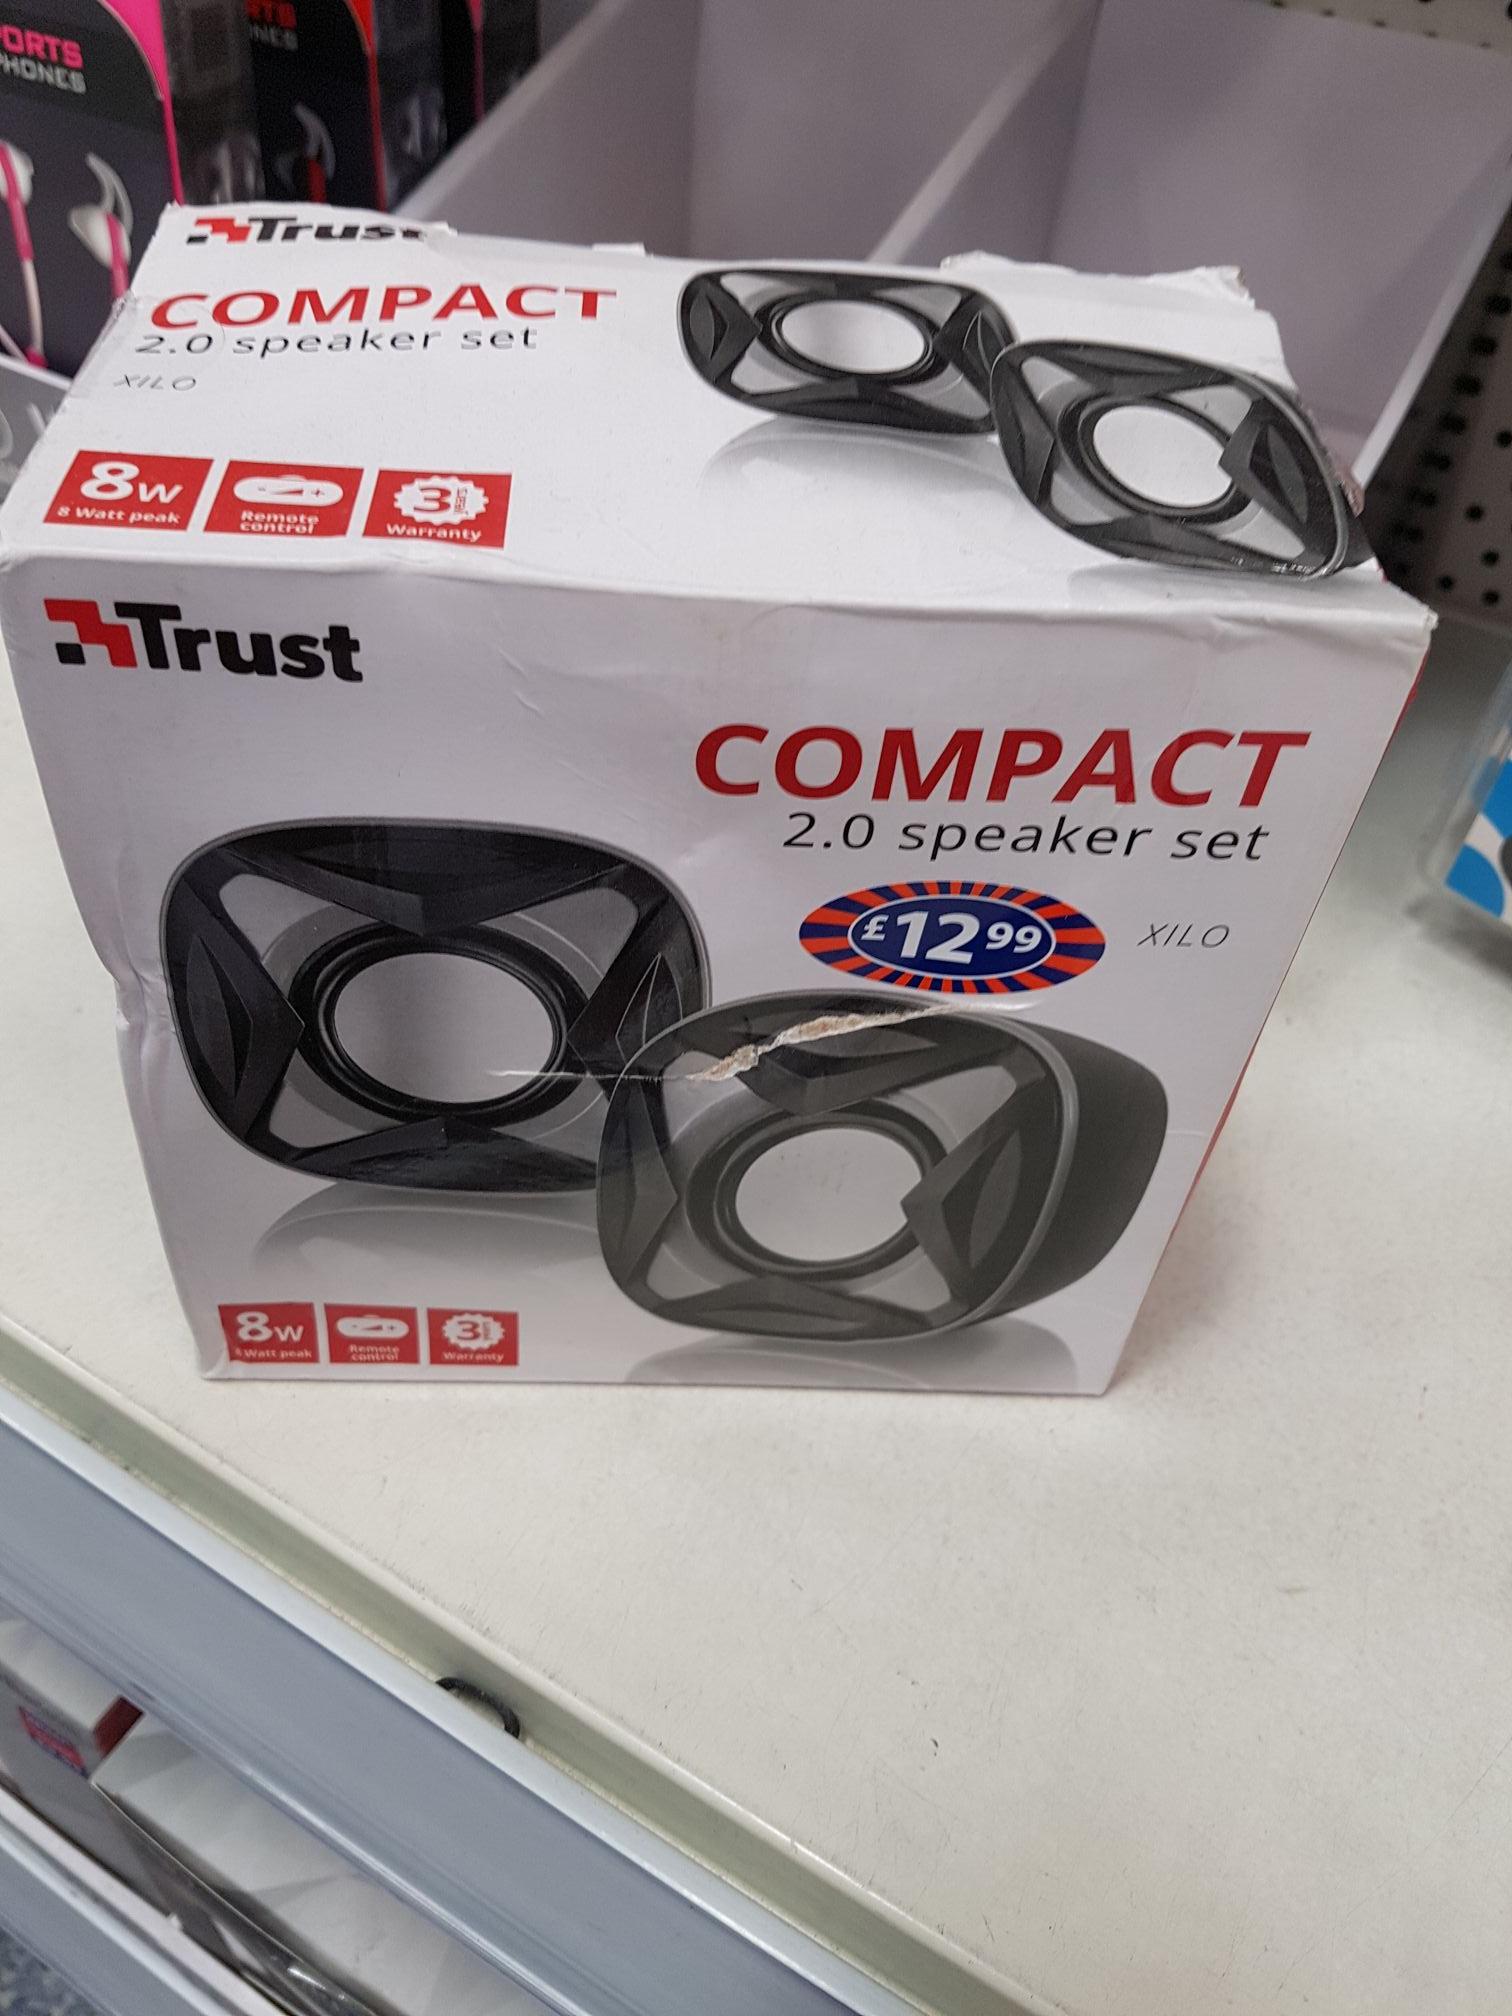 Trust USB compact speaker set £1 @ B&M